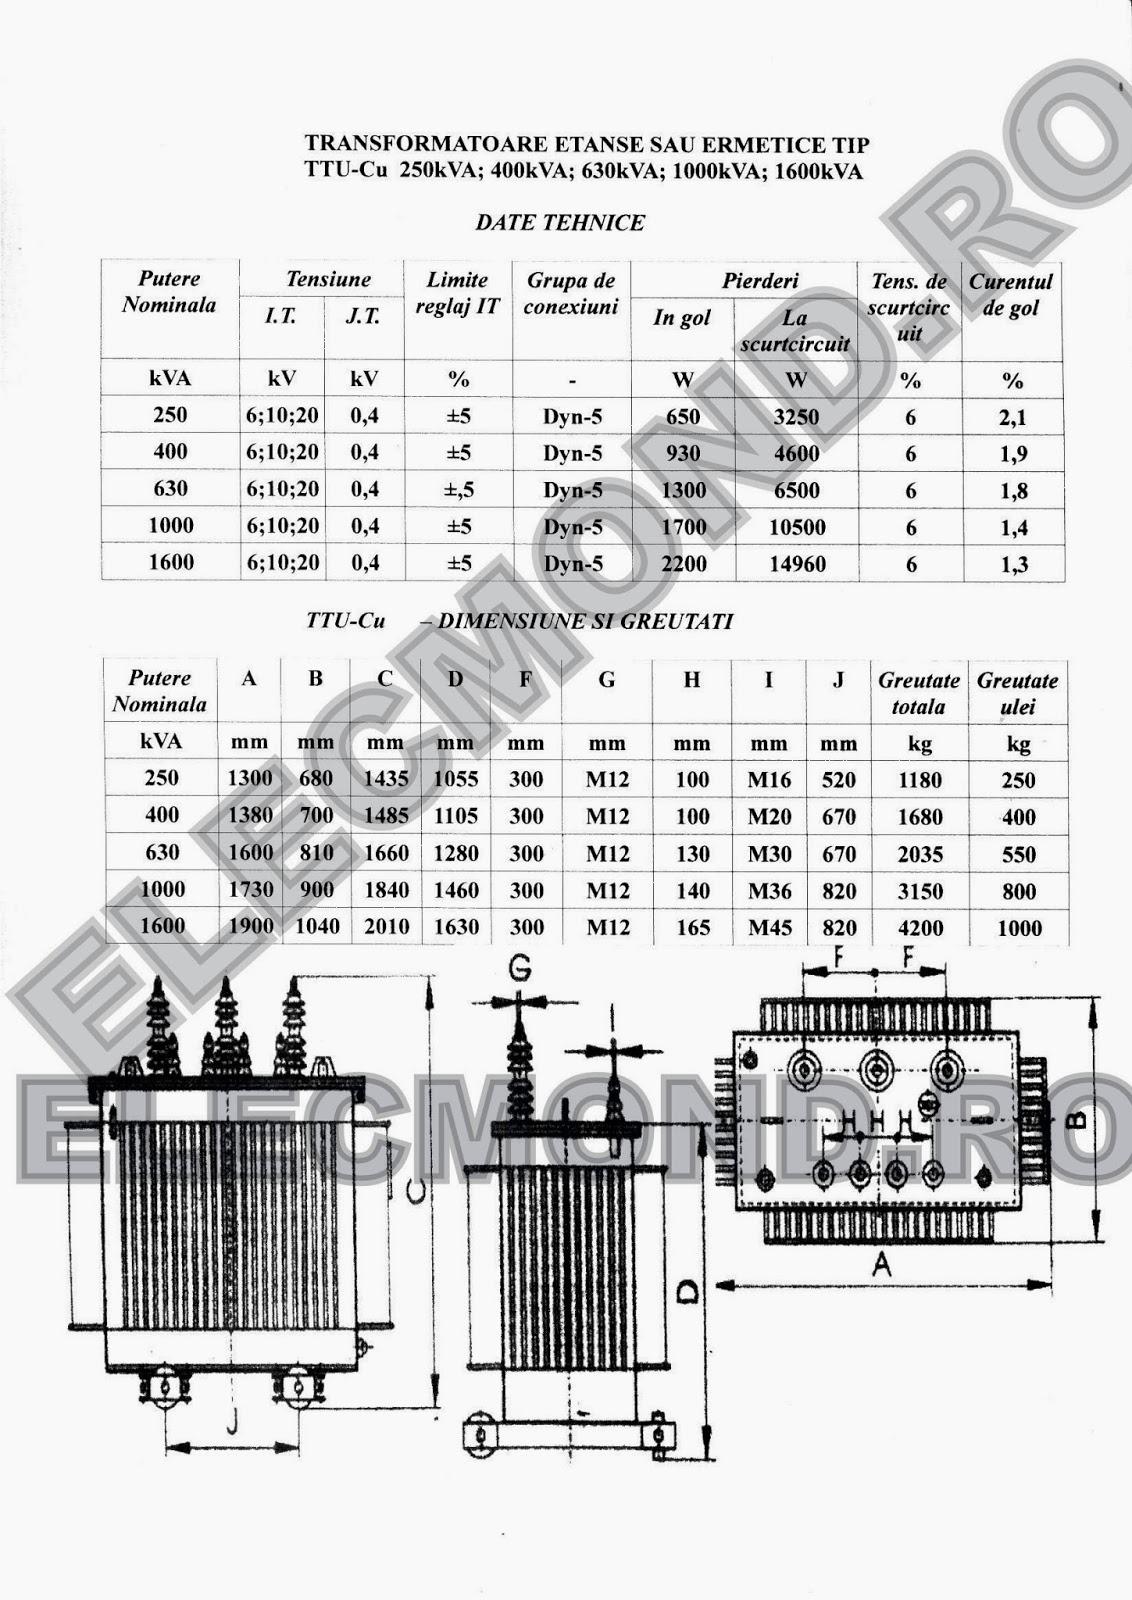 DATE TEHNICE TRANSFORMATOARE ERMETICE ETANSE  CUPRU 250 kVA 400 kVA 630 kVA 1000 kVA 1600 kVA